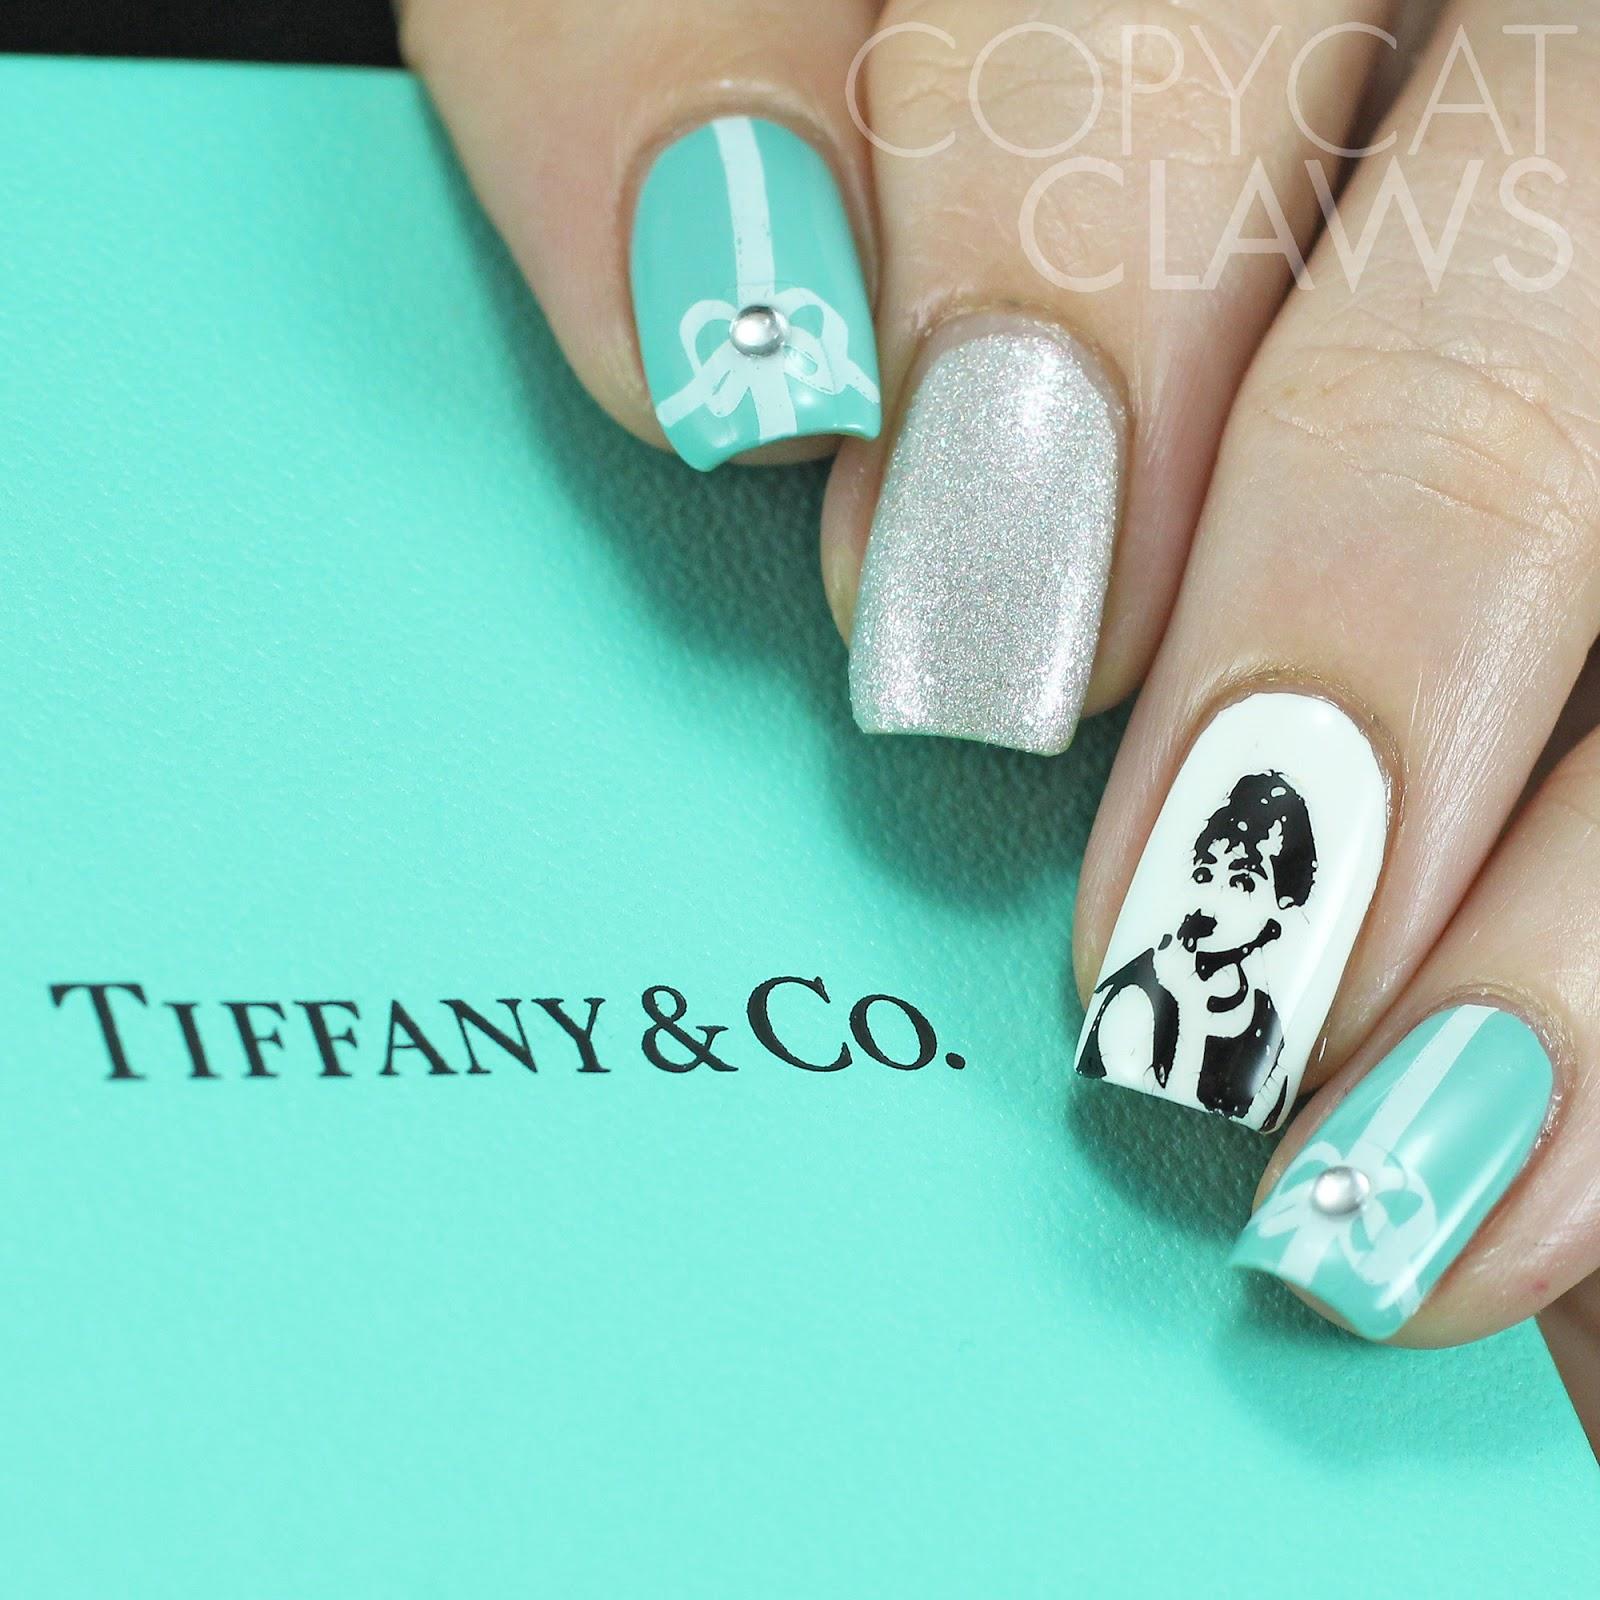 Tiffany Blue Nail Art: Copycat Claws: Sunday Stamping